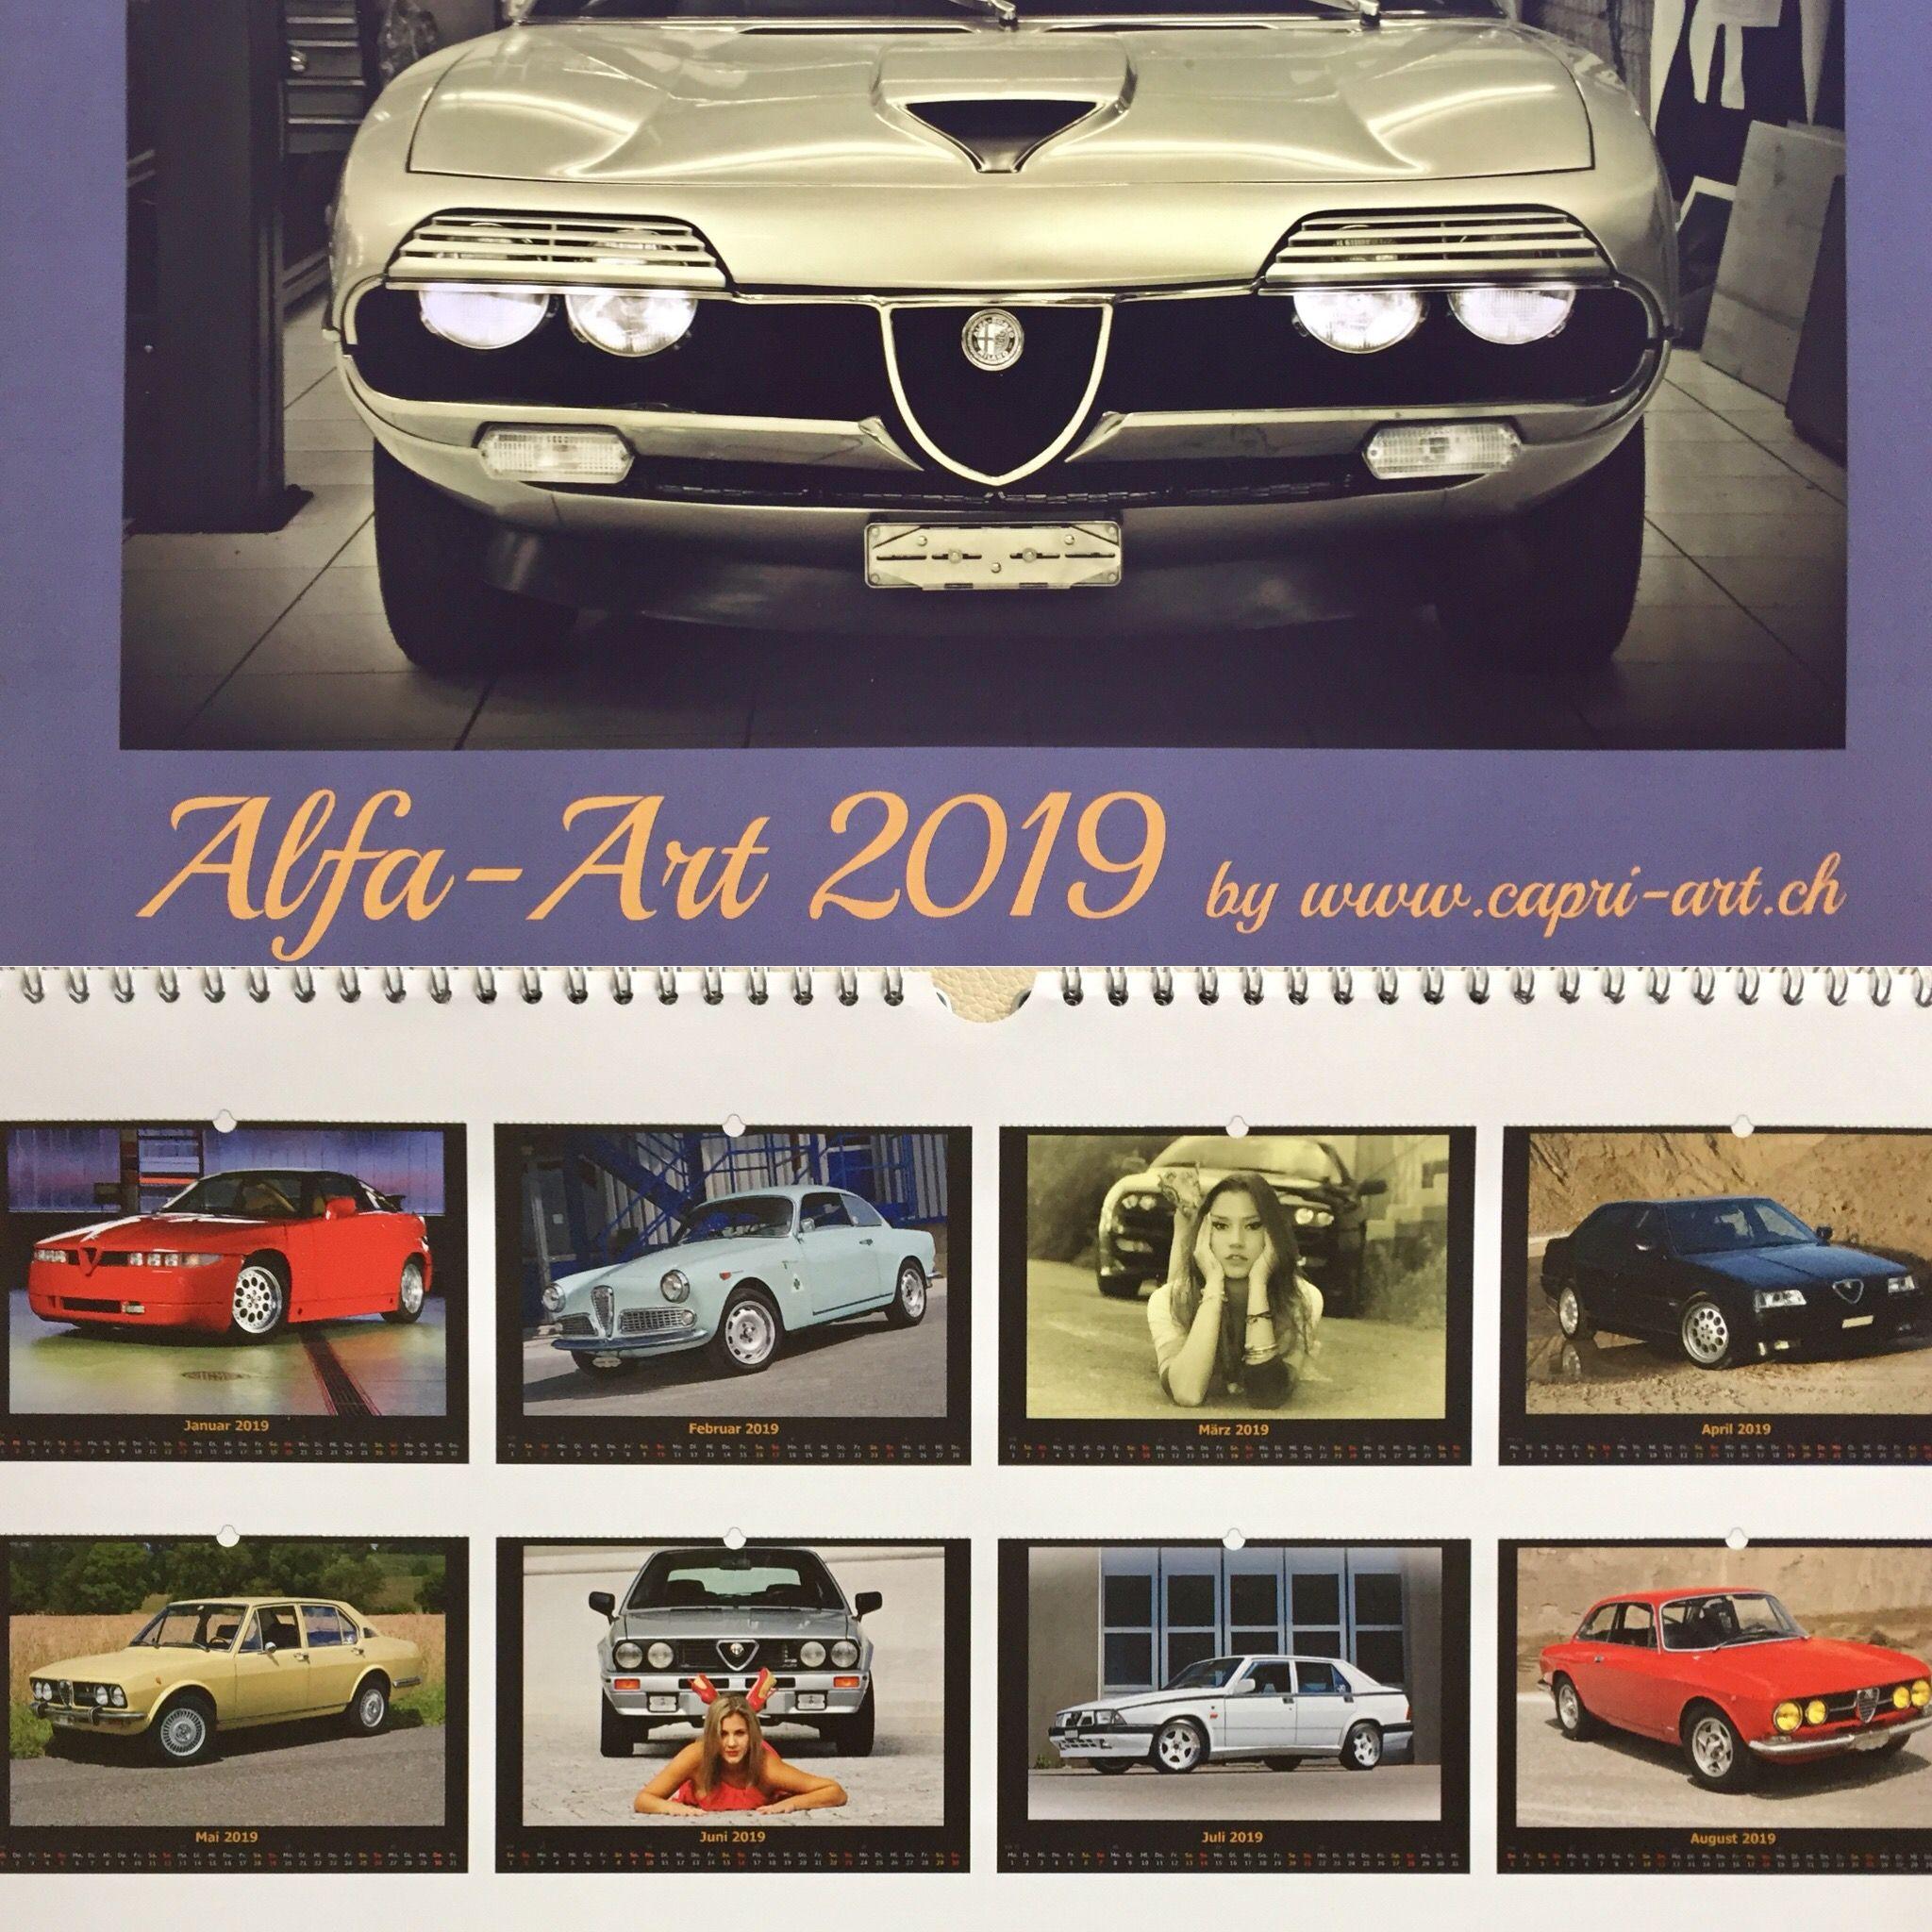 Pin Von Rolizingg Auf Alfa Romeo Kalender 2019